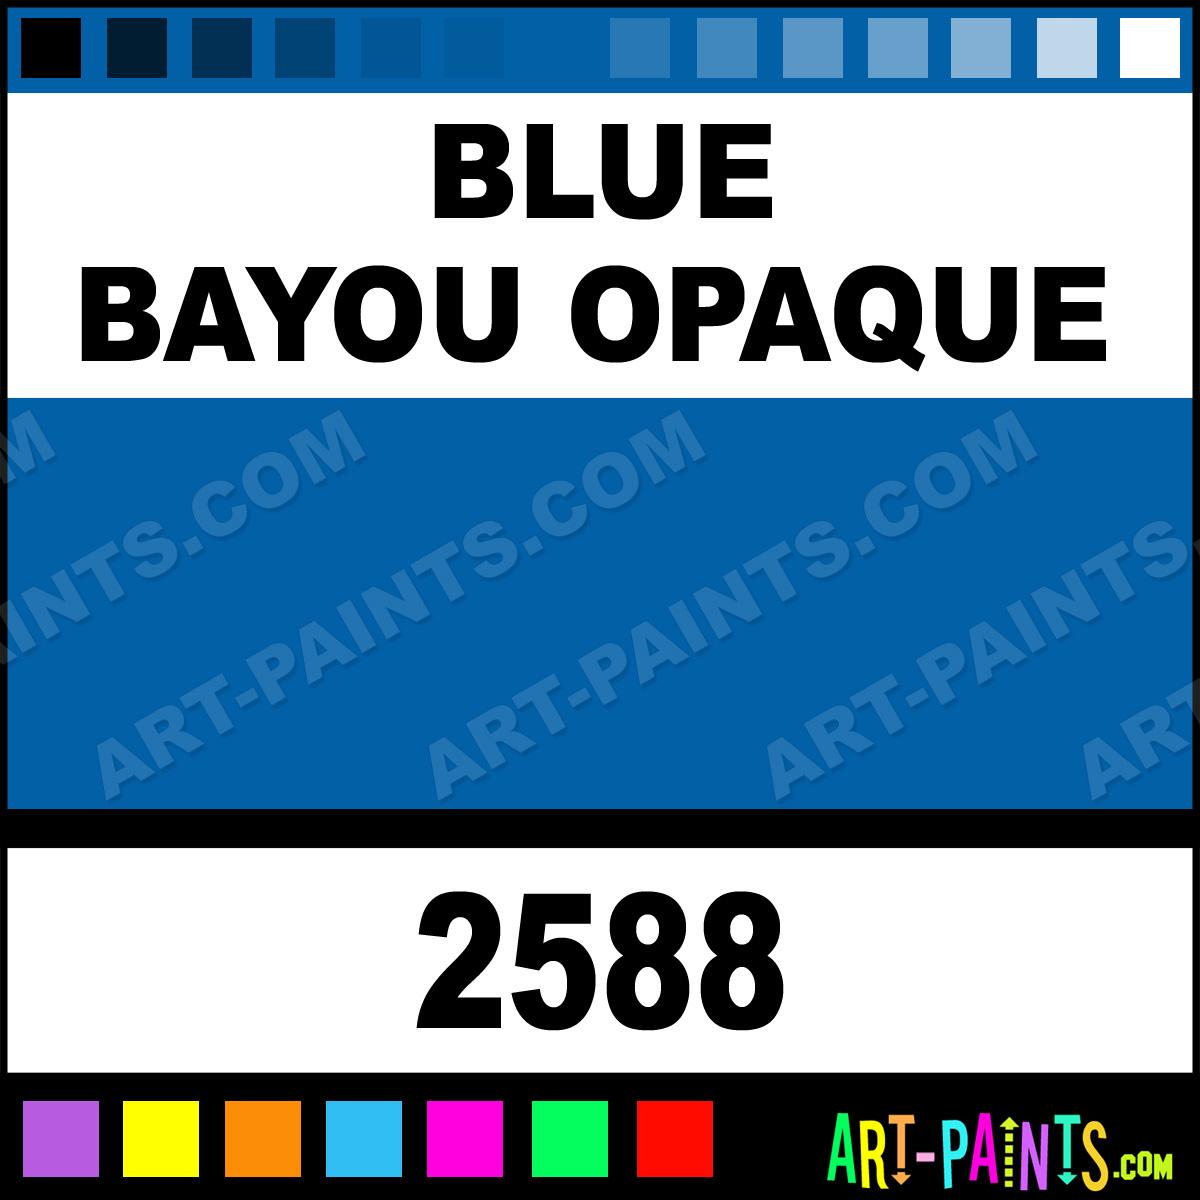 Blue bayou opaque delta acrylic paints 2588 blue bayou opaque blue bayou opaque paint 2588 by ceramcoat delta paints nvjuhfo Choice Image